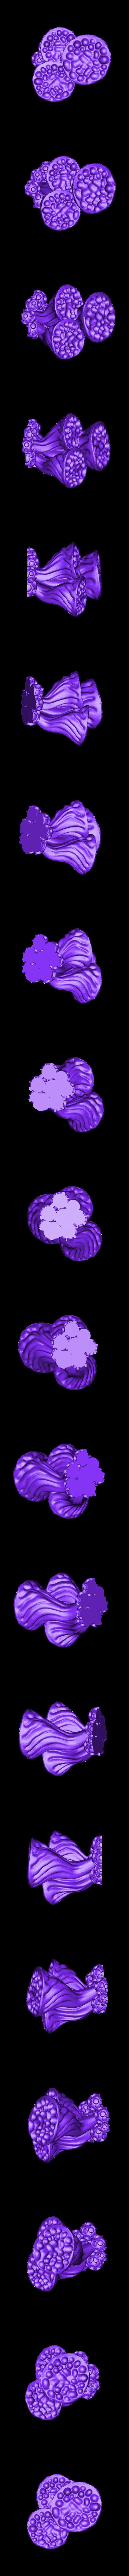 AlienPlant2.stl Download free STL file Alien Flora series 3 (any scale) • 3D print model, Dutchmogul